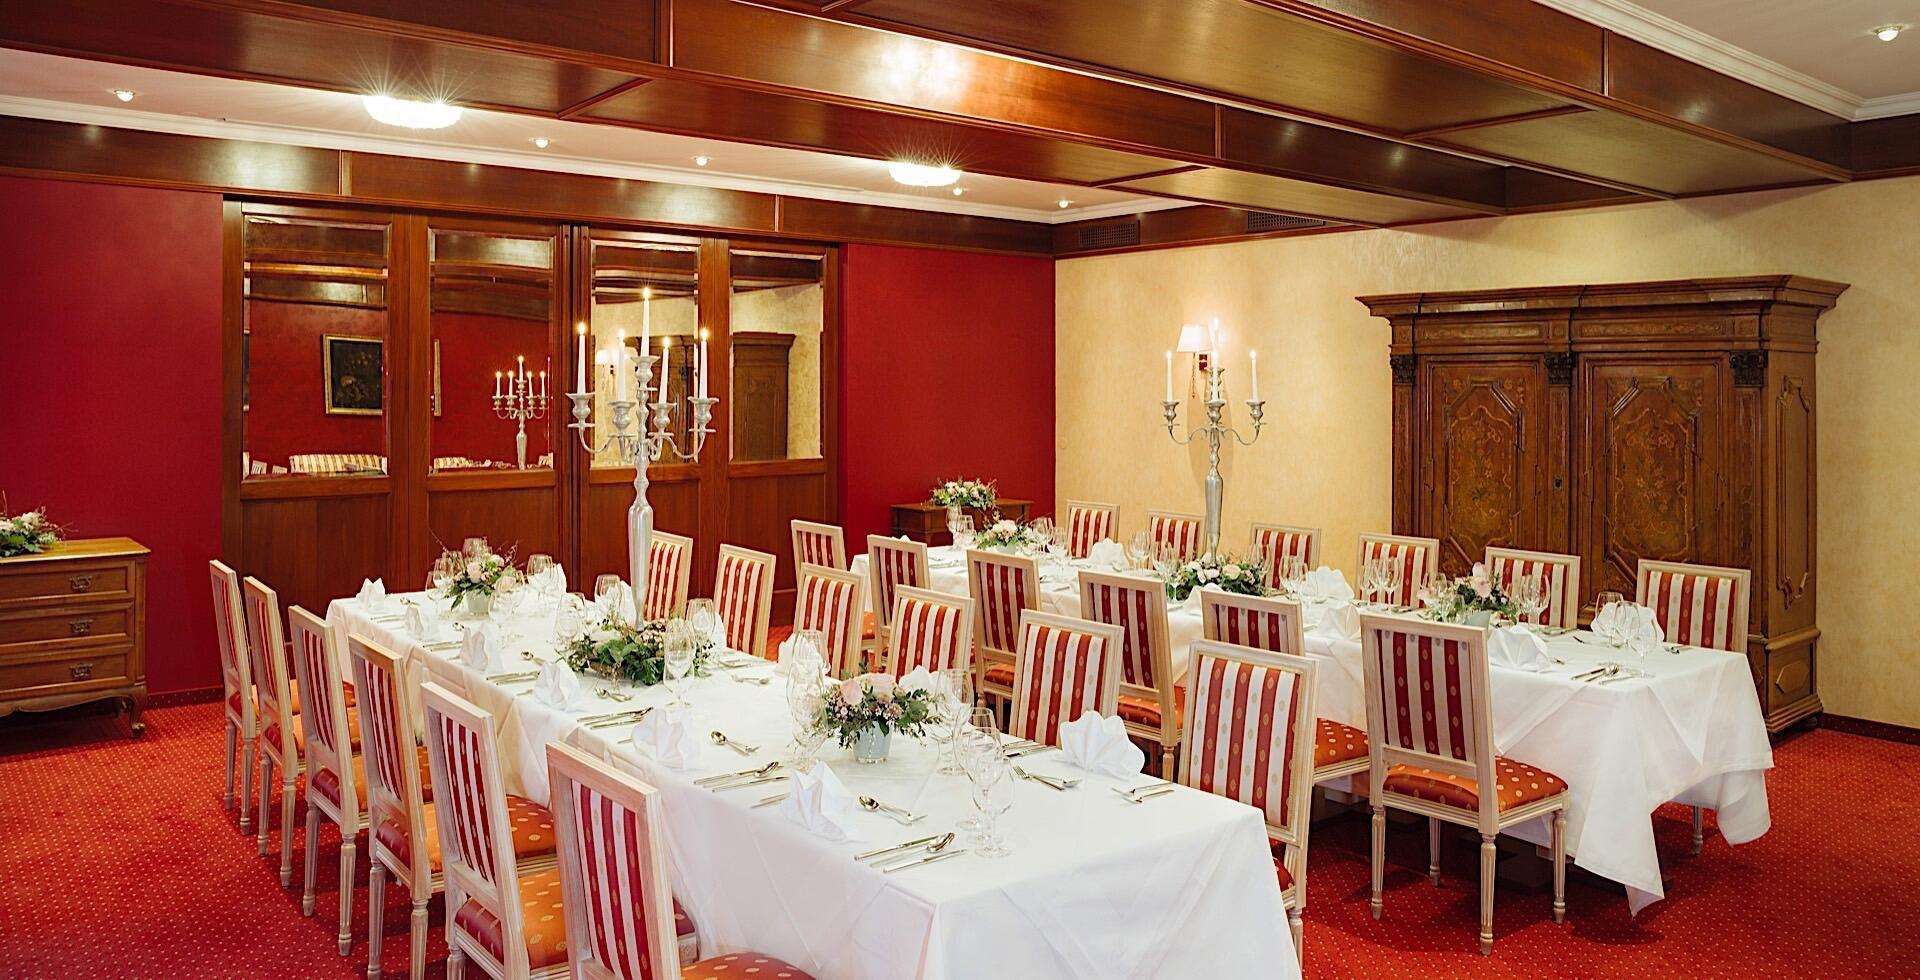 Gala im Roten Salon im Schloss Pichlarn